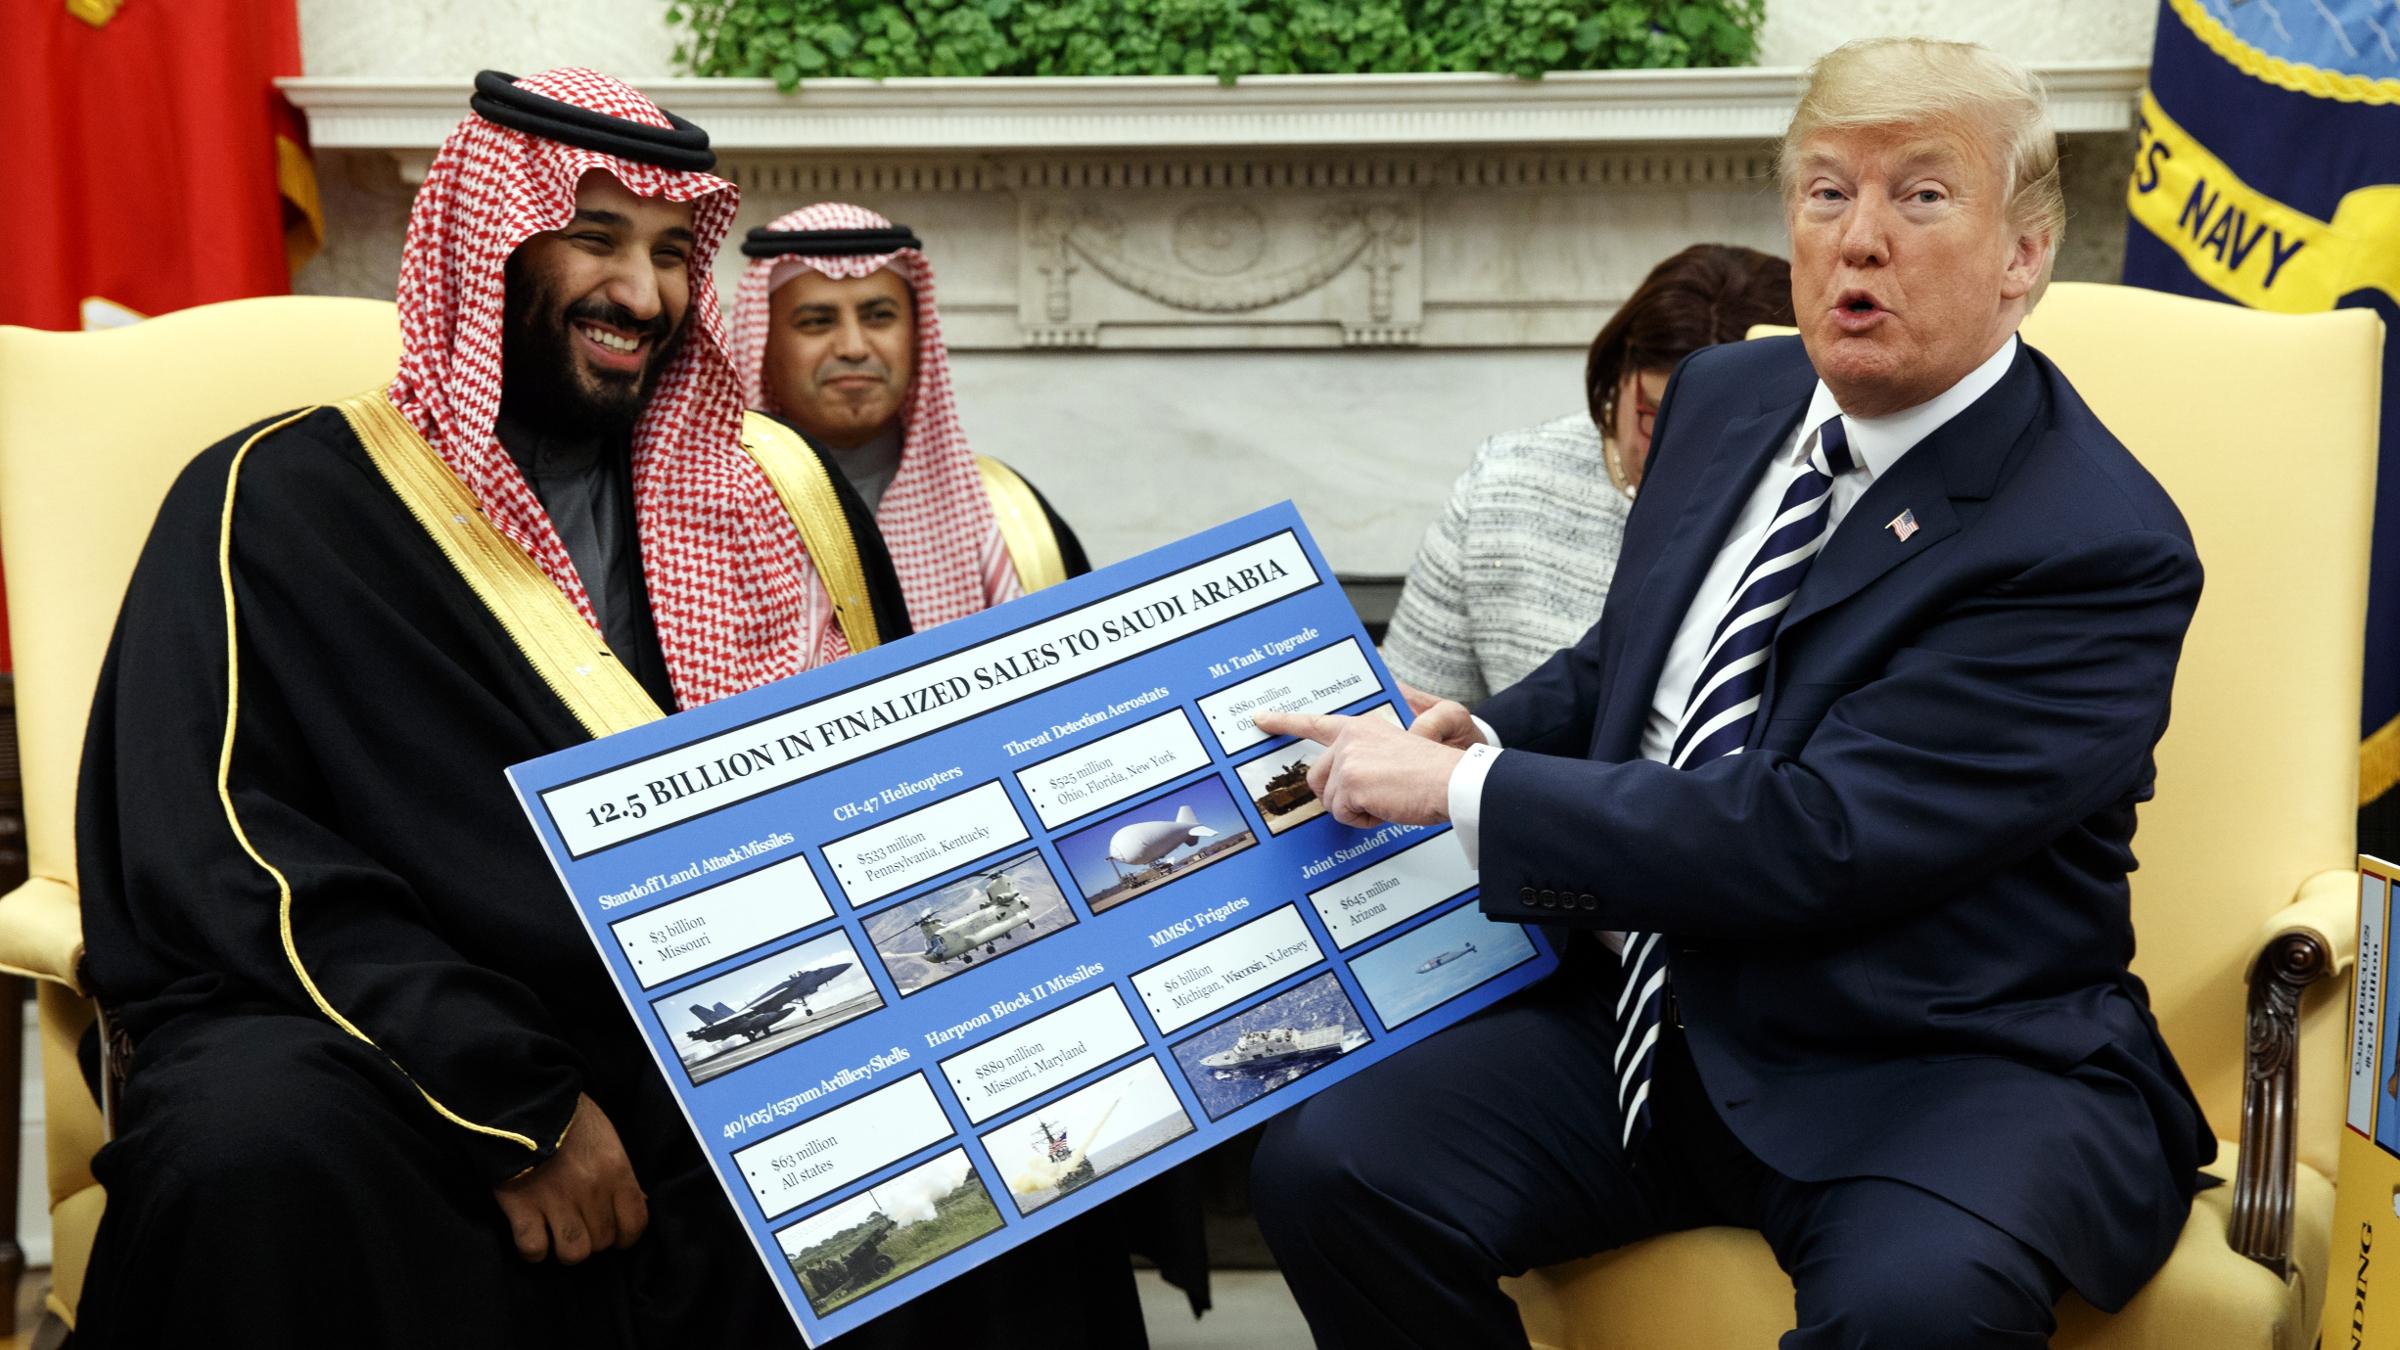 Saudi Arabia's money means more to Trump than Khashoggi's life — Quartz